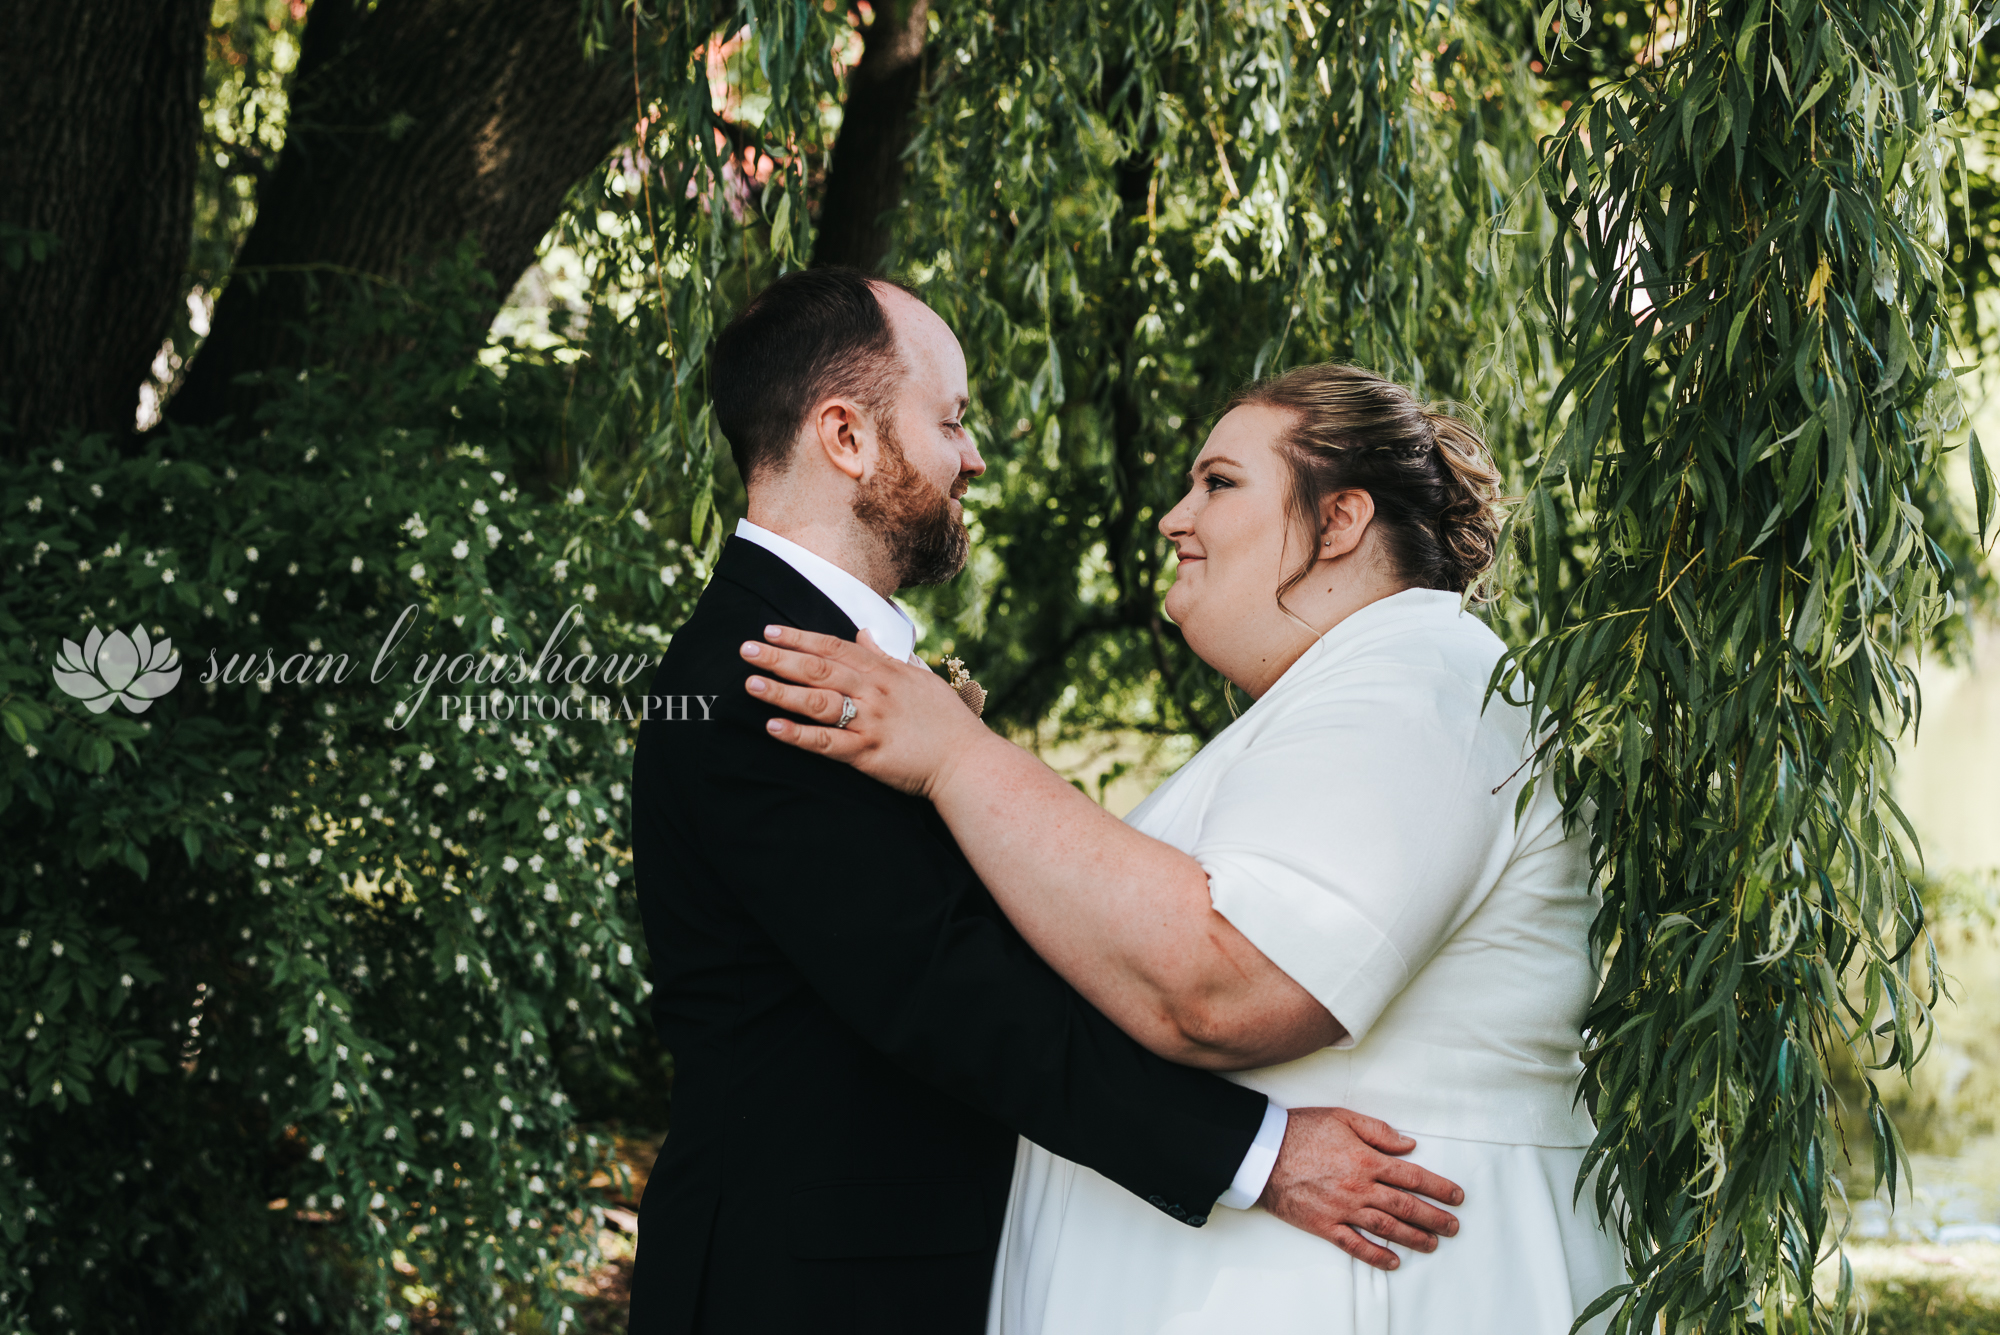 Bill and Sarah Wedding Photos 06-08-2019 SLY Photography -62.jpg